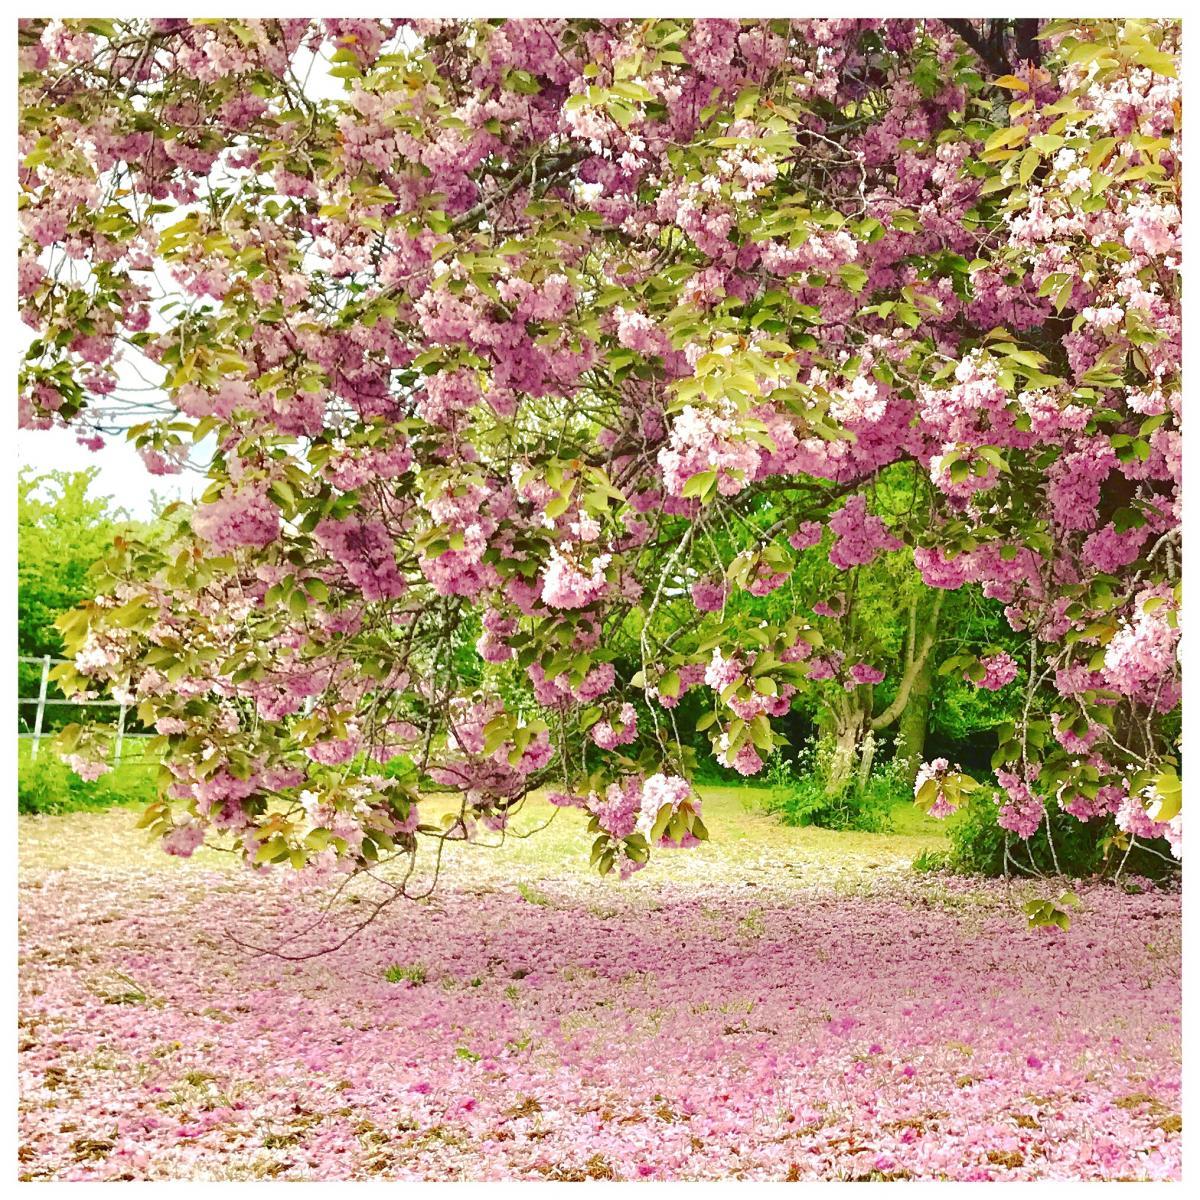 Be Like A Tree - Wednesday Wisdom 25